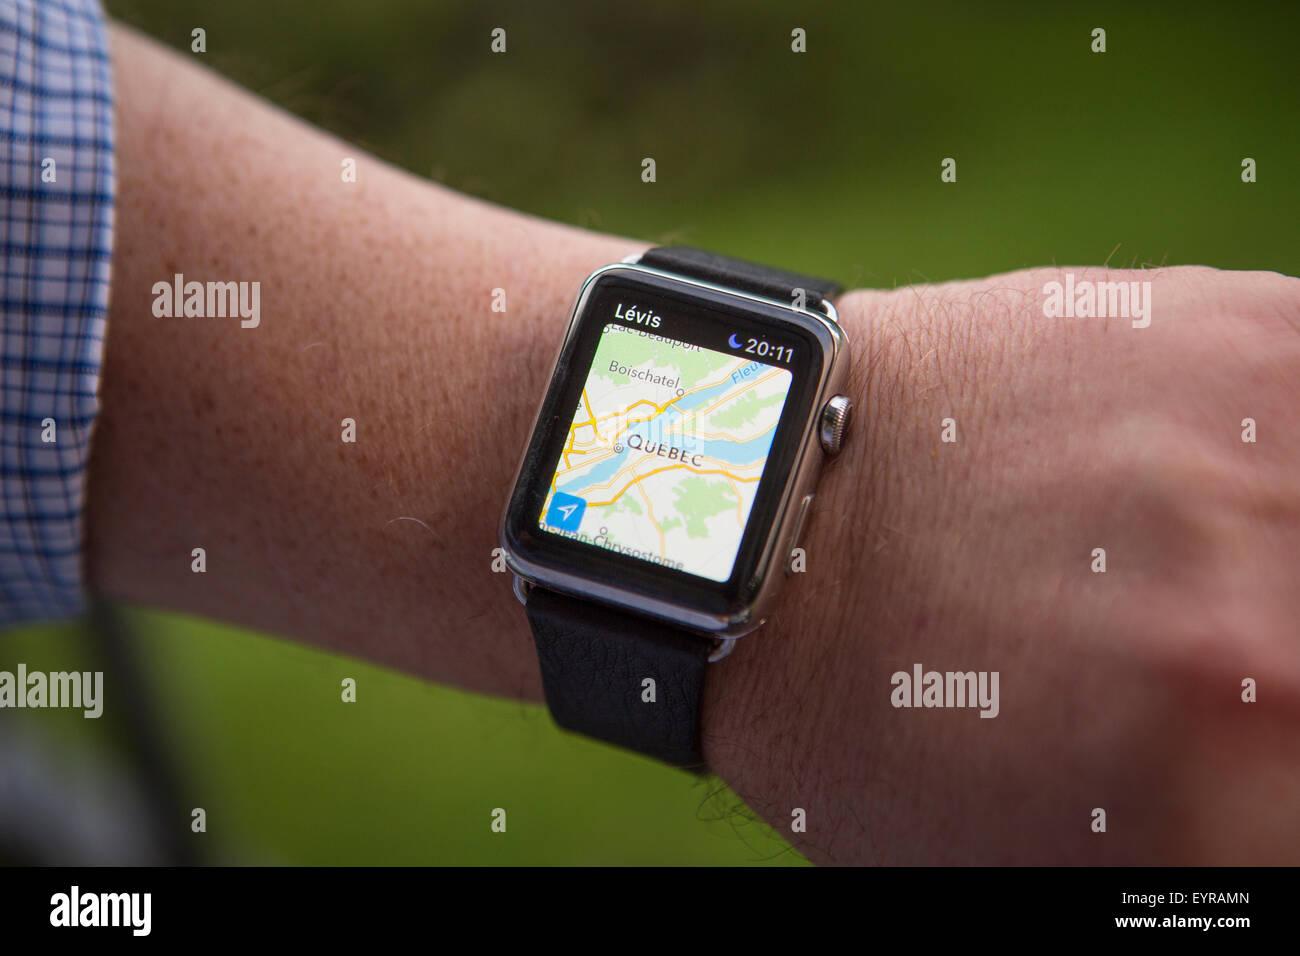 6acfc0ed6b063b A man uses an Apple Watch Saturday August 1